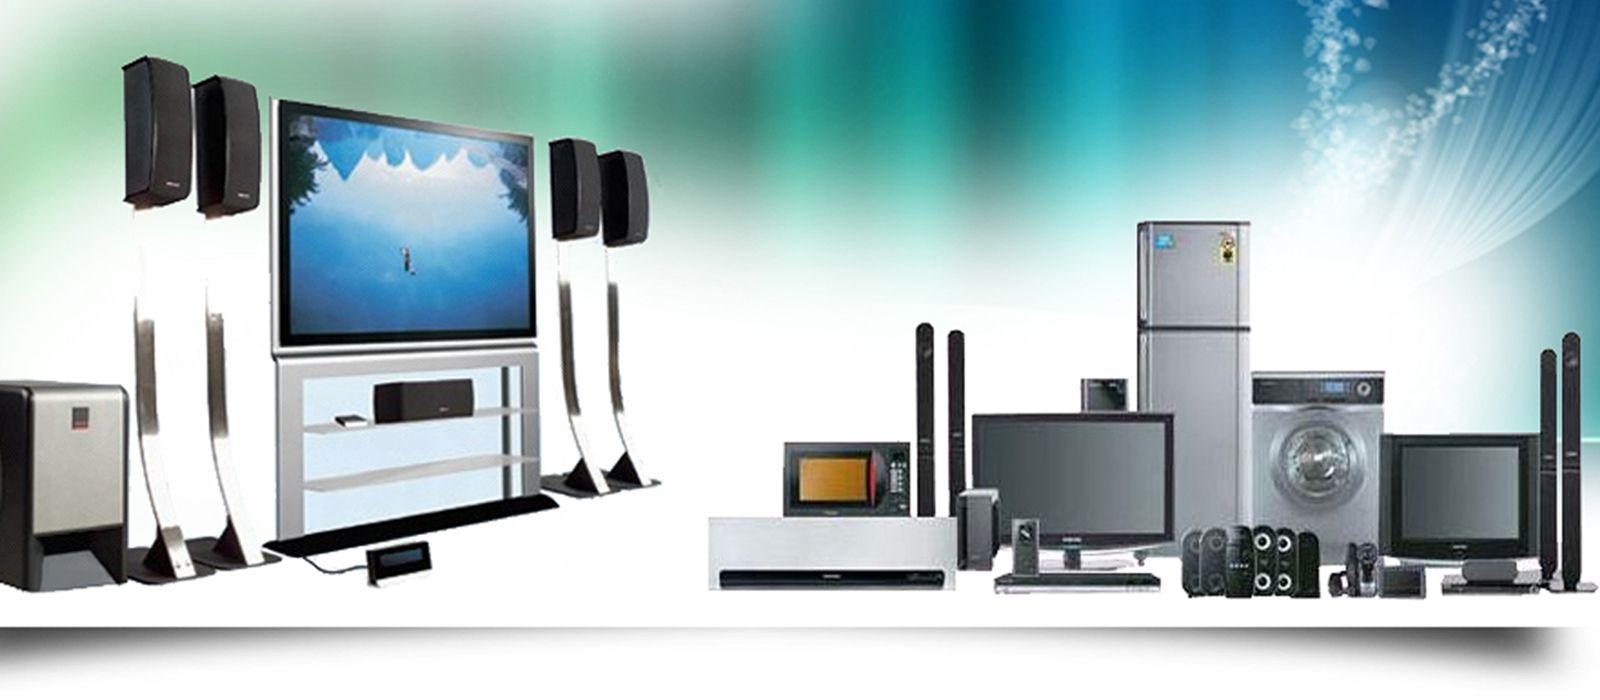 Electronics Offer